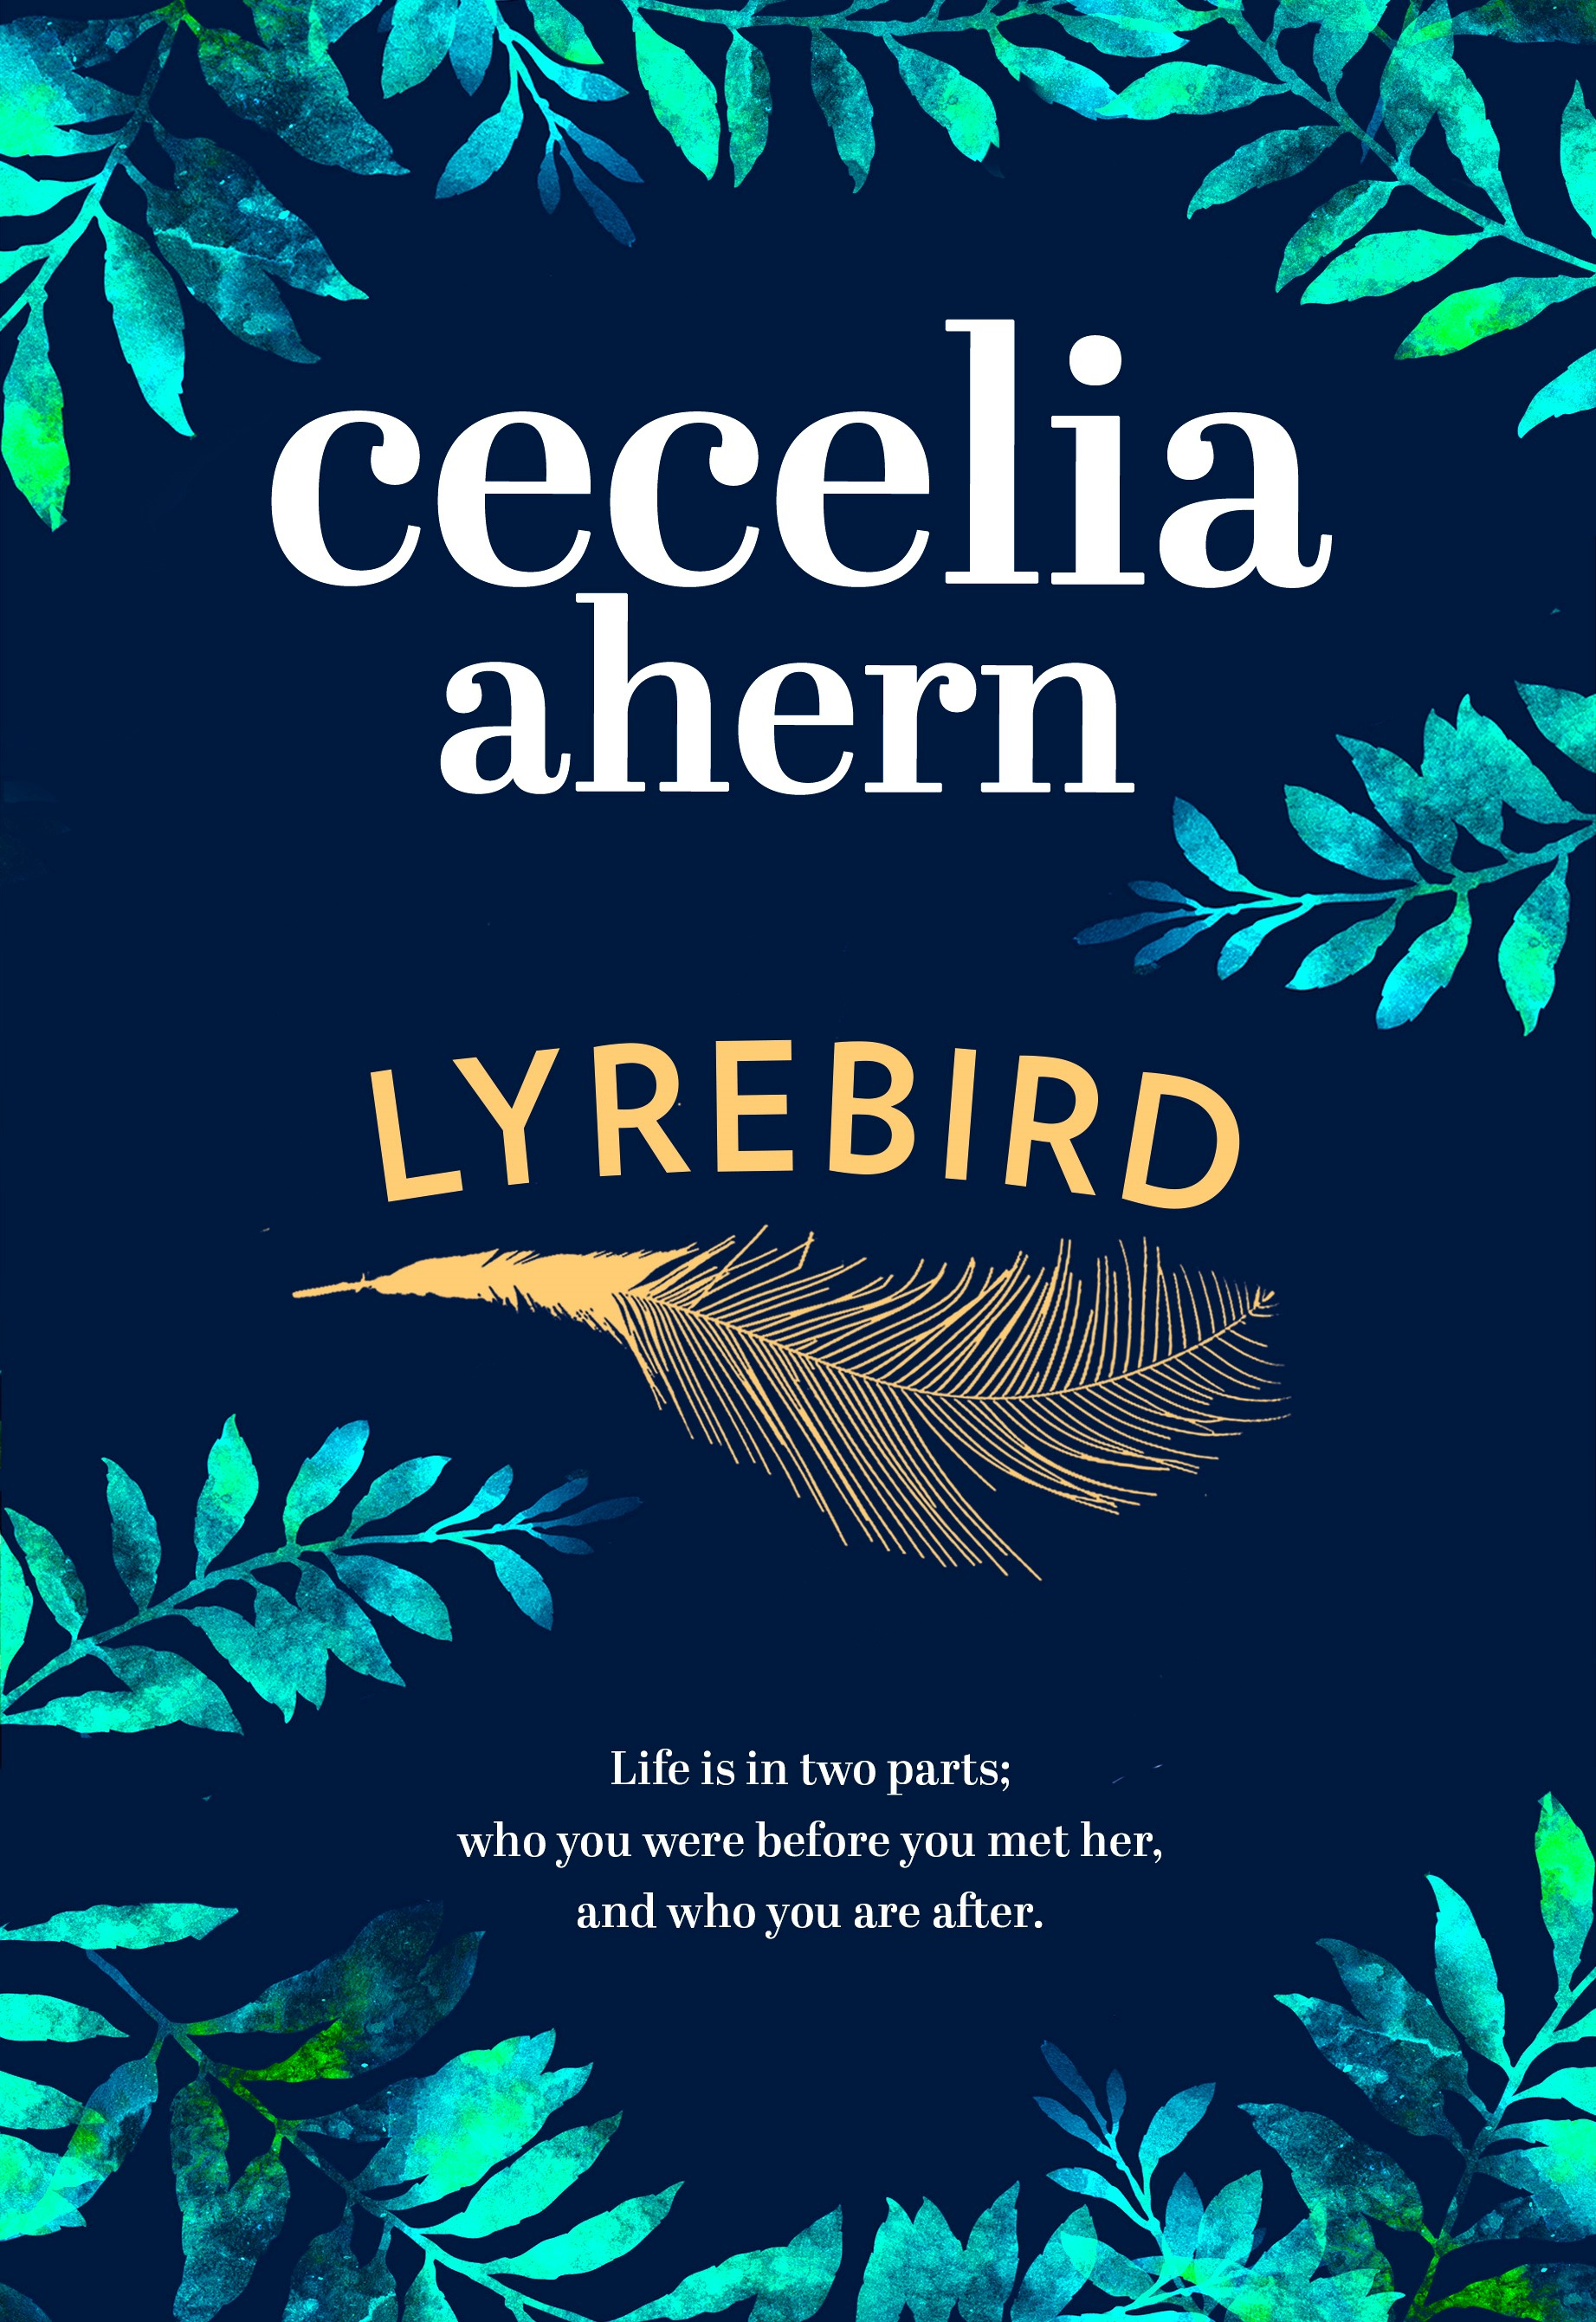 Image result for lyrebird cecelia ahern